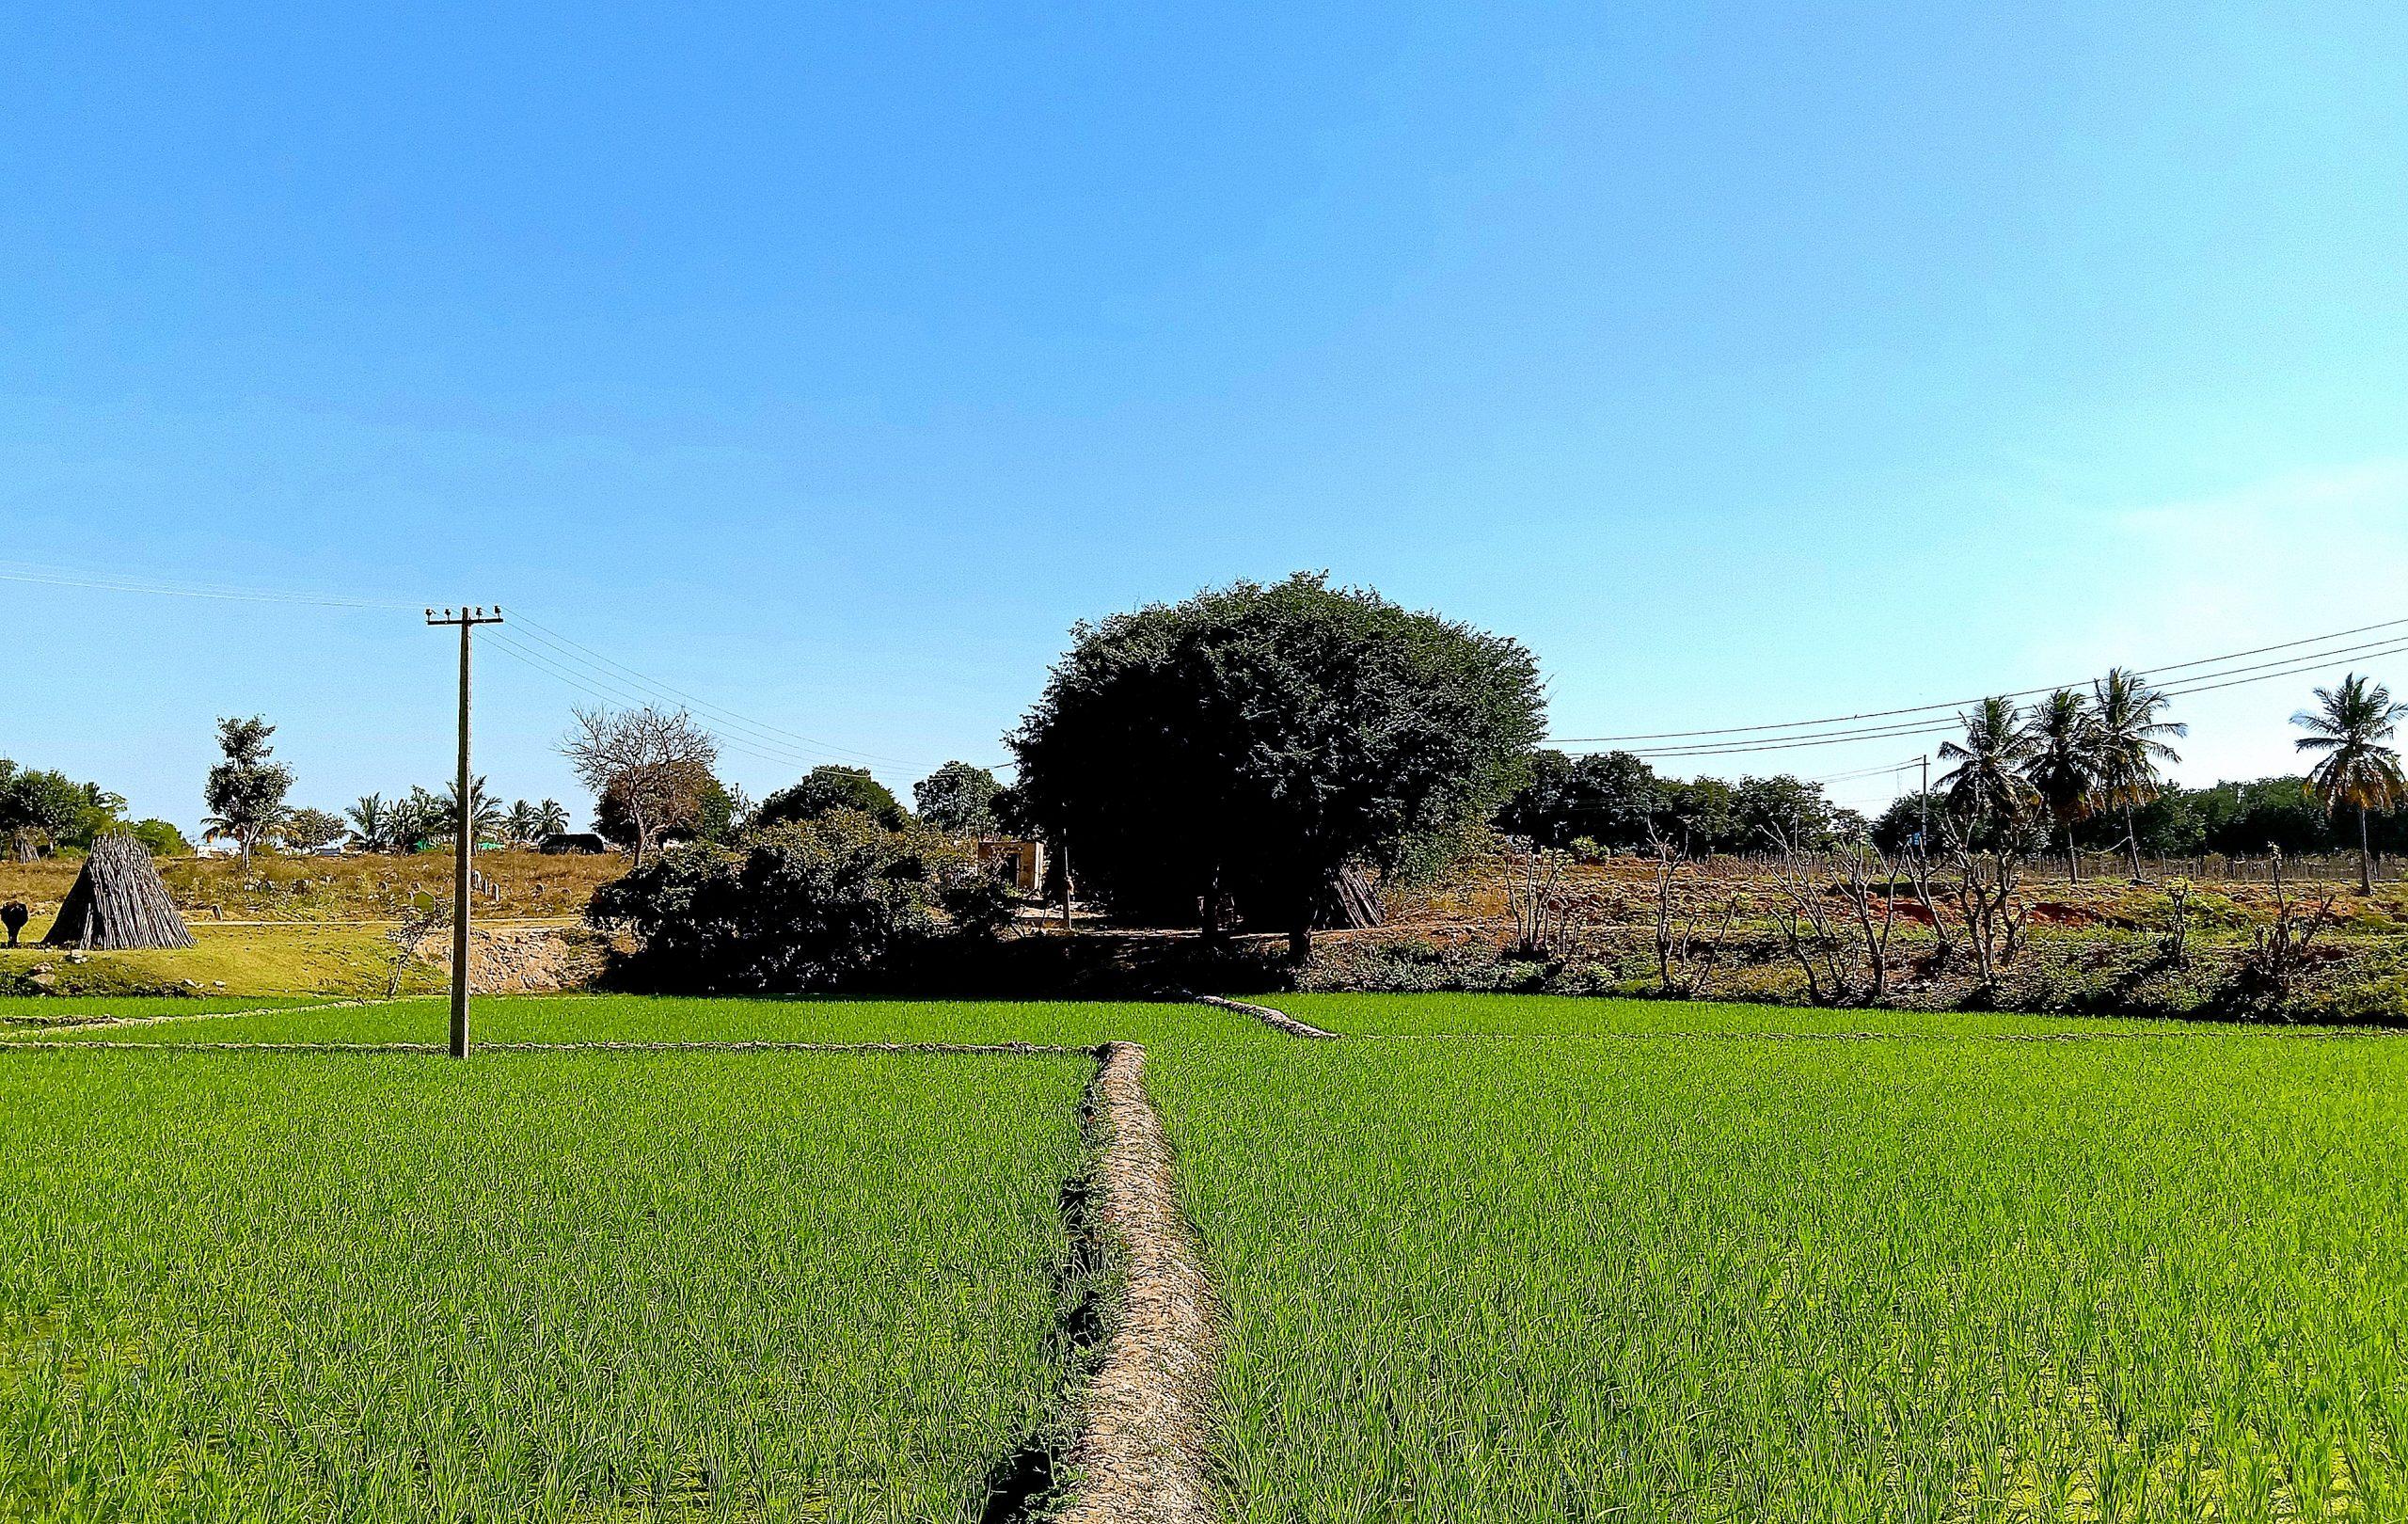 Crop in farm